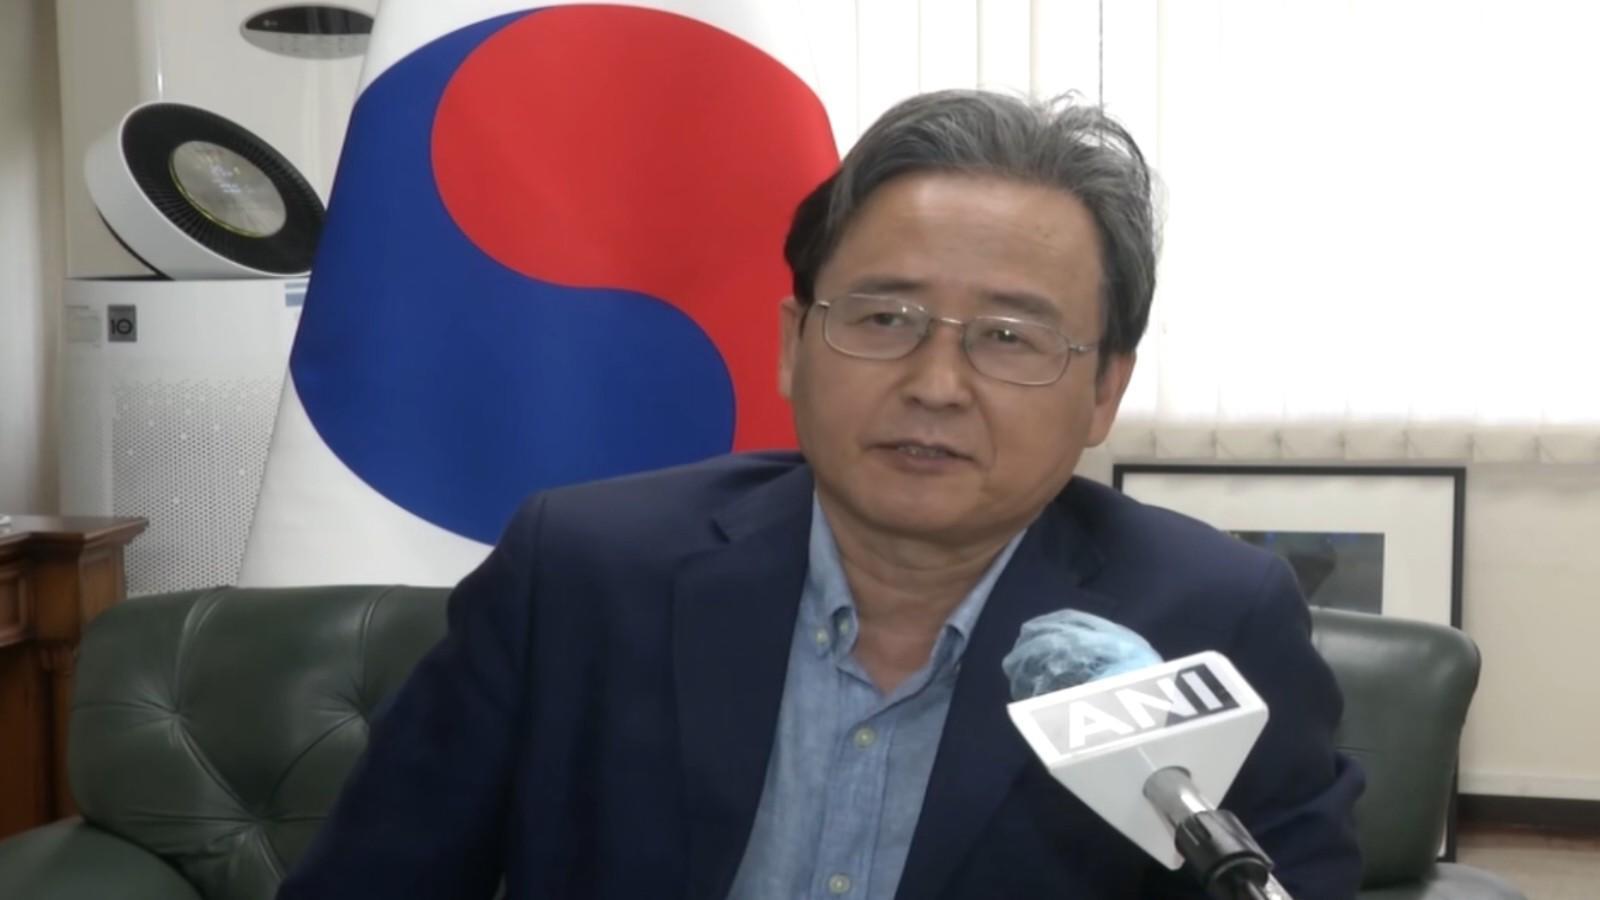 s-korea-thinking-to-establish-korean-language-institute-in-delhi-says-envoy